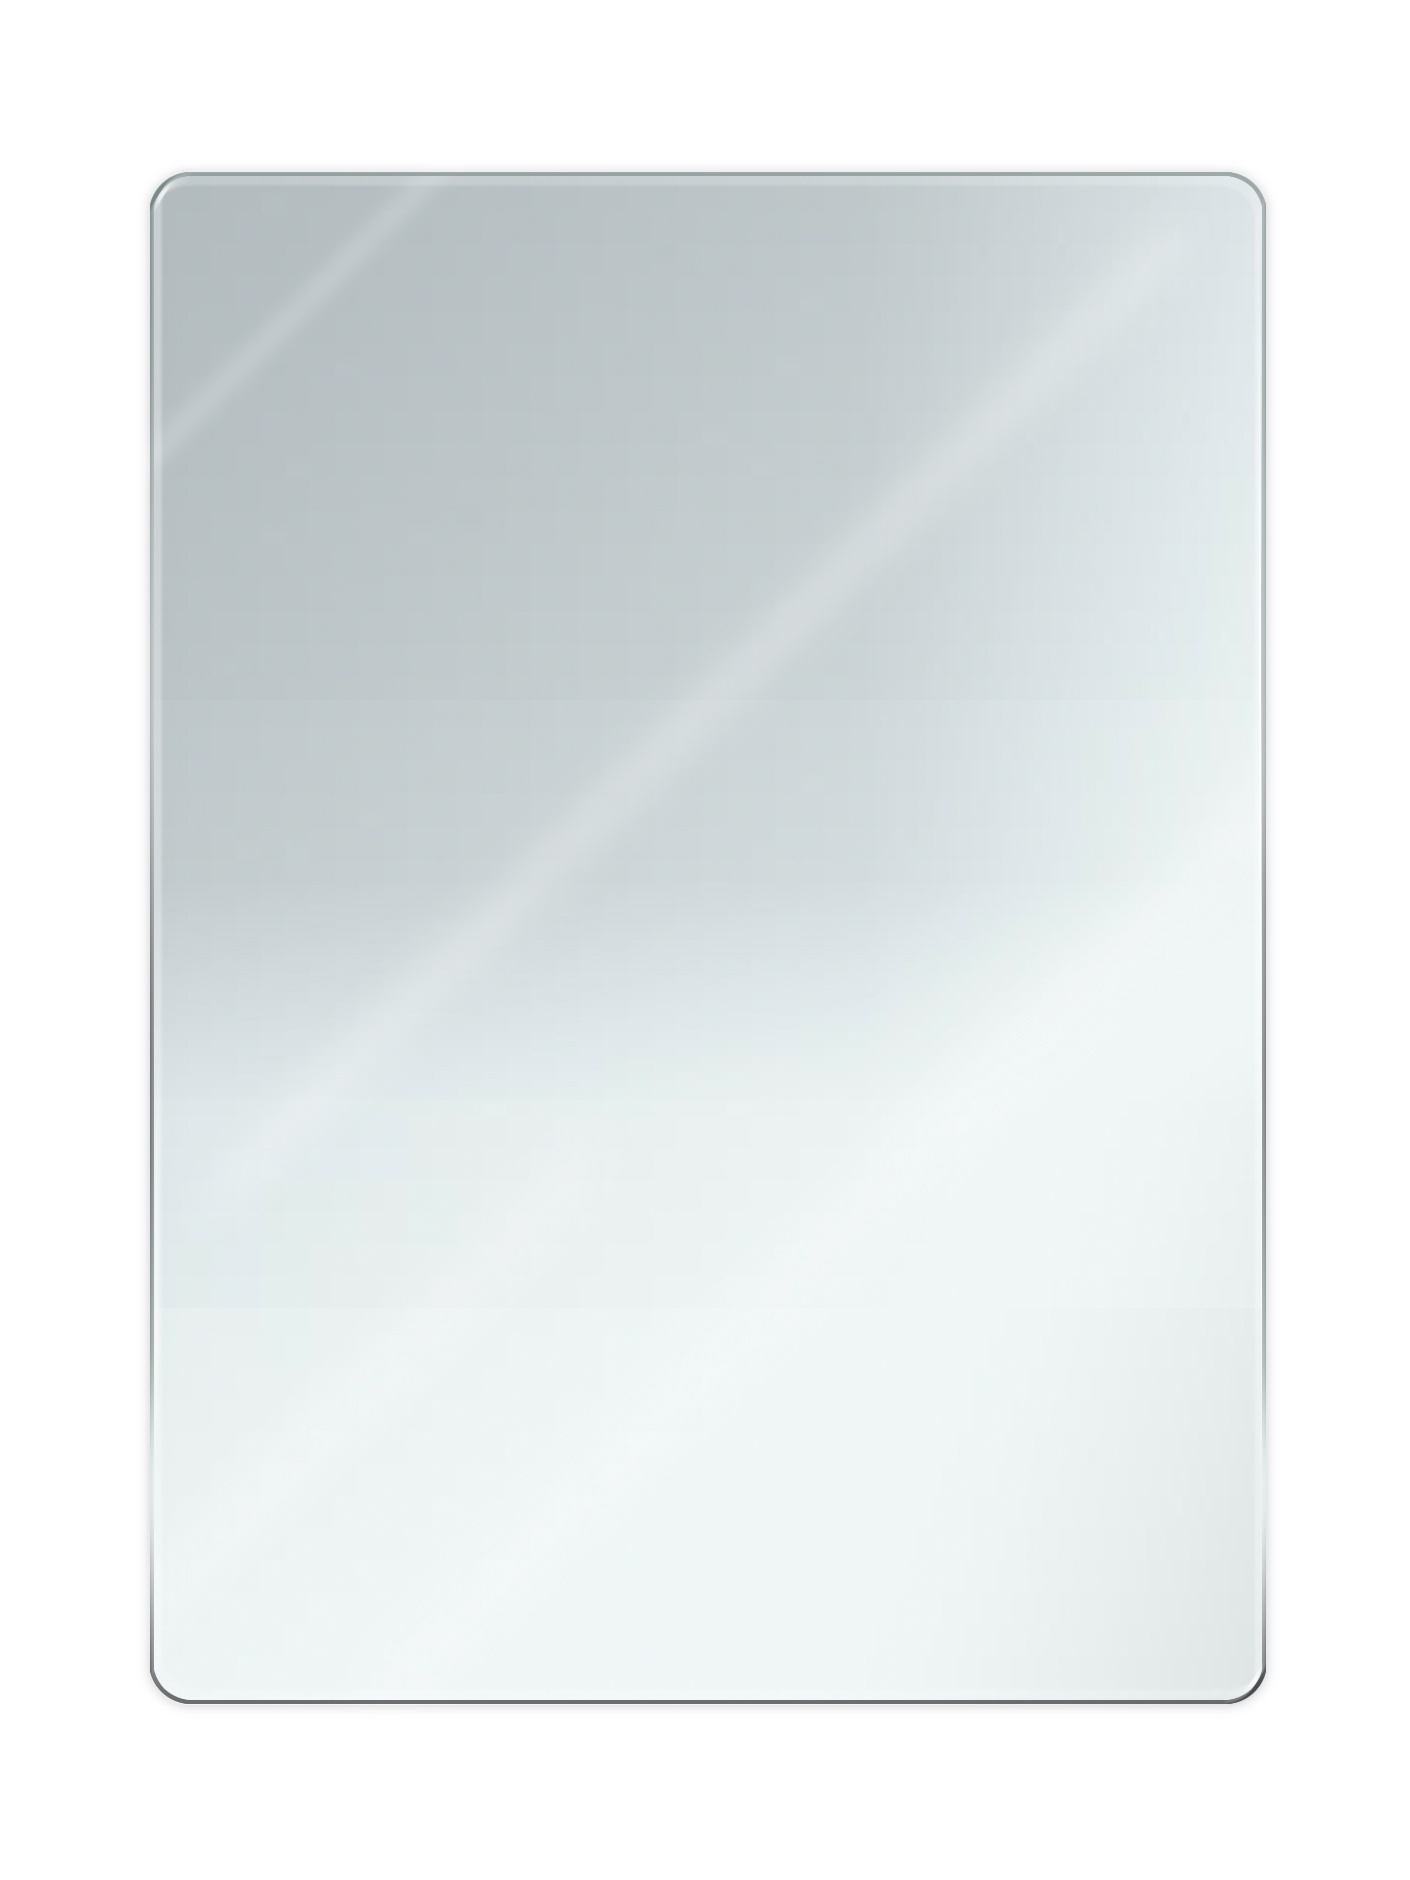 Зеркало интерьерное GoldBasket Экран зубило rennsteig re 4210000 зубила 125мм 150мм пробойники 3мм 4мм кернер 4мм в наборе 6шт